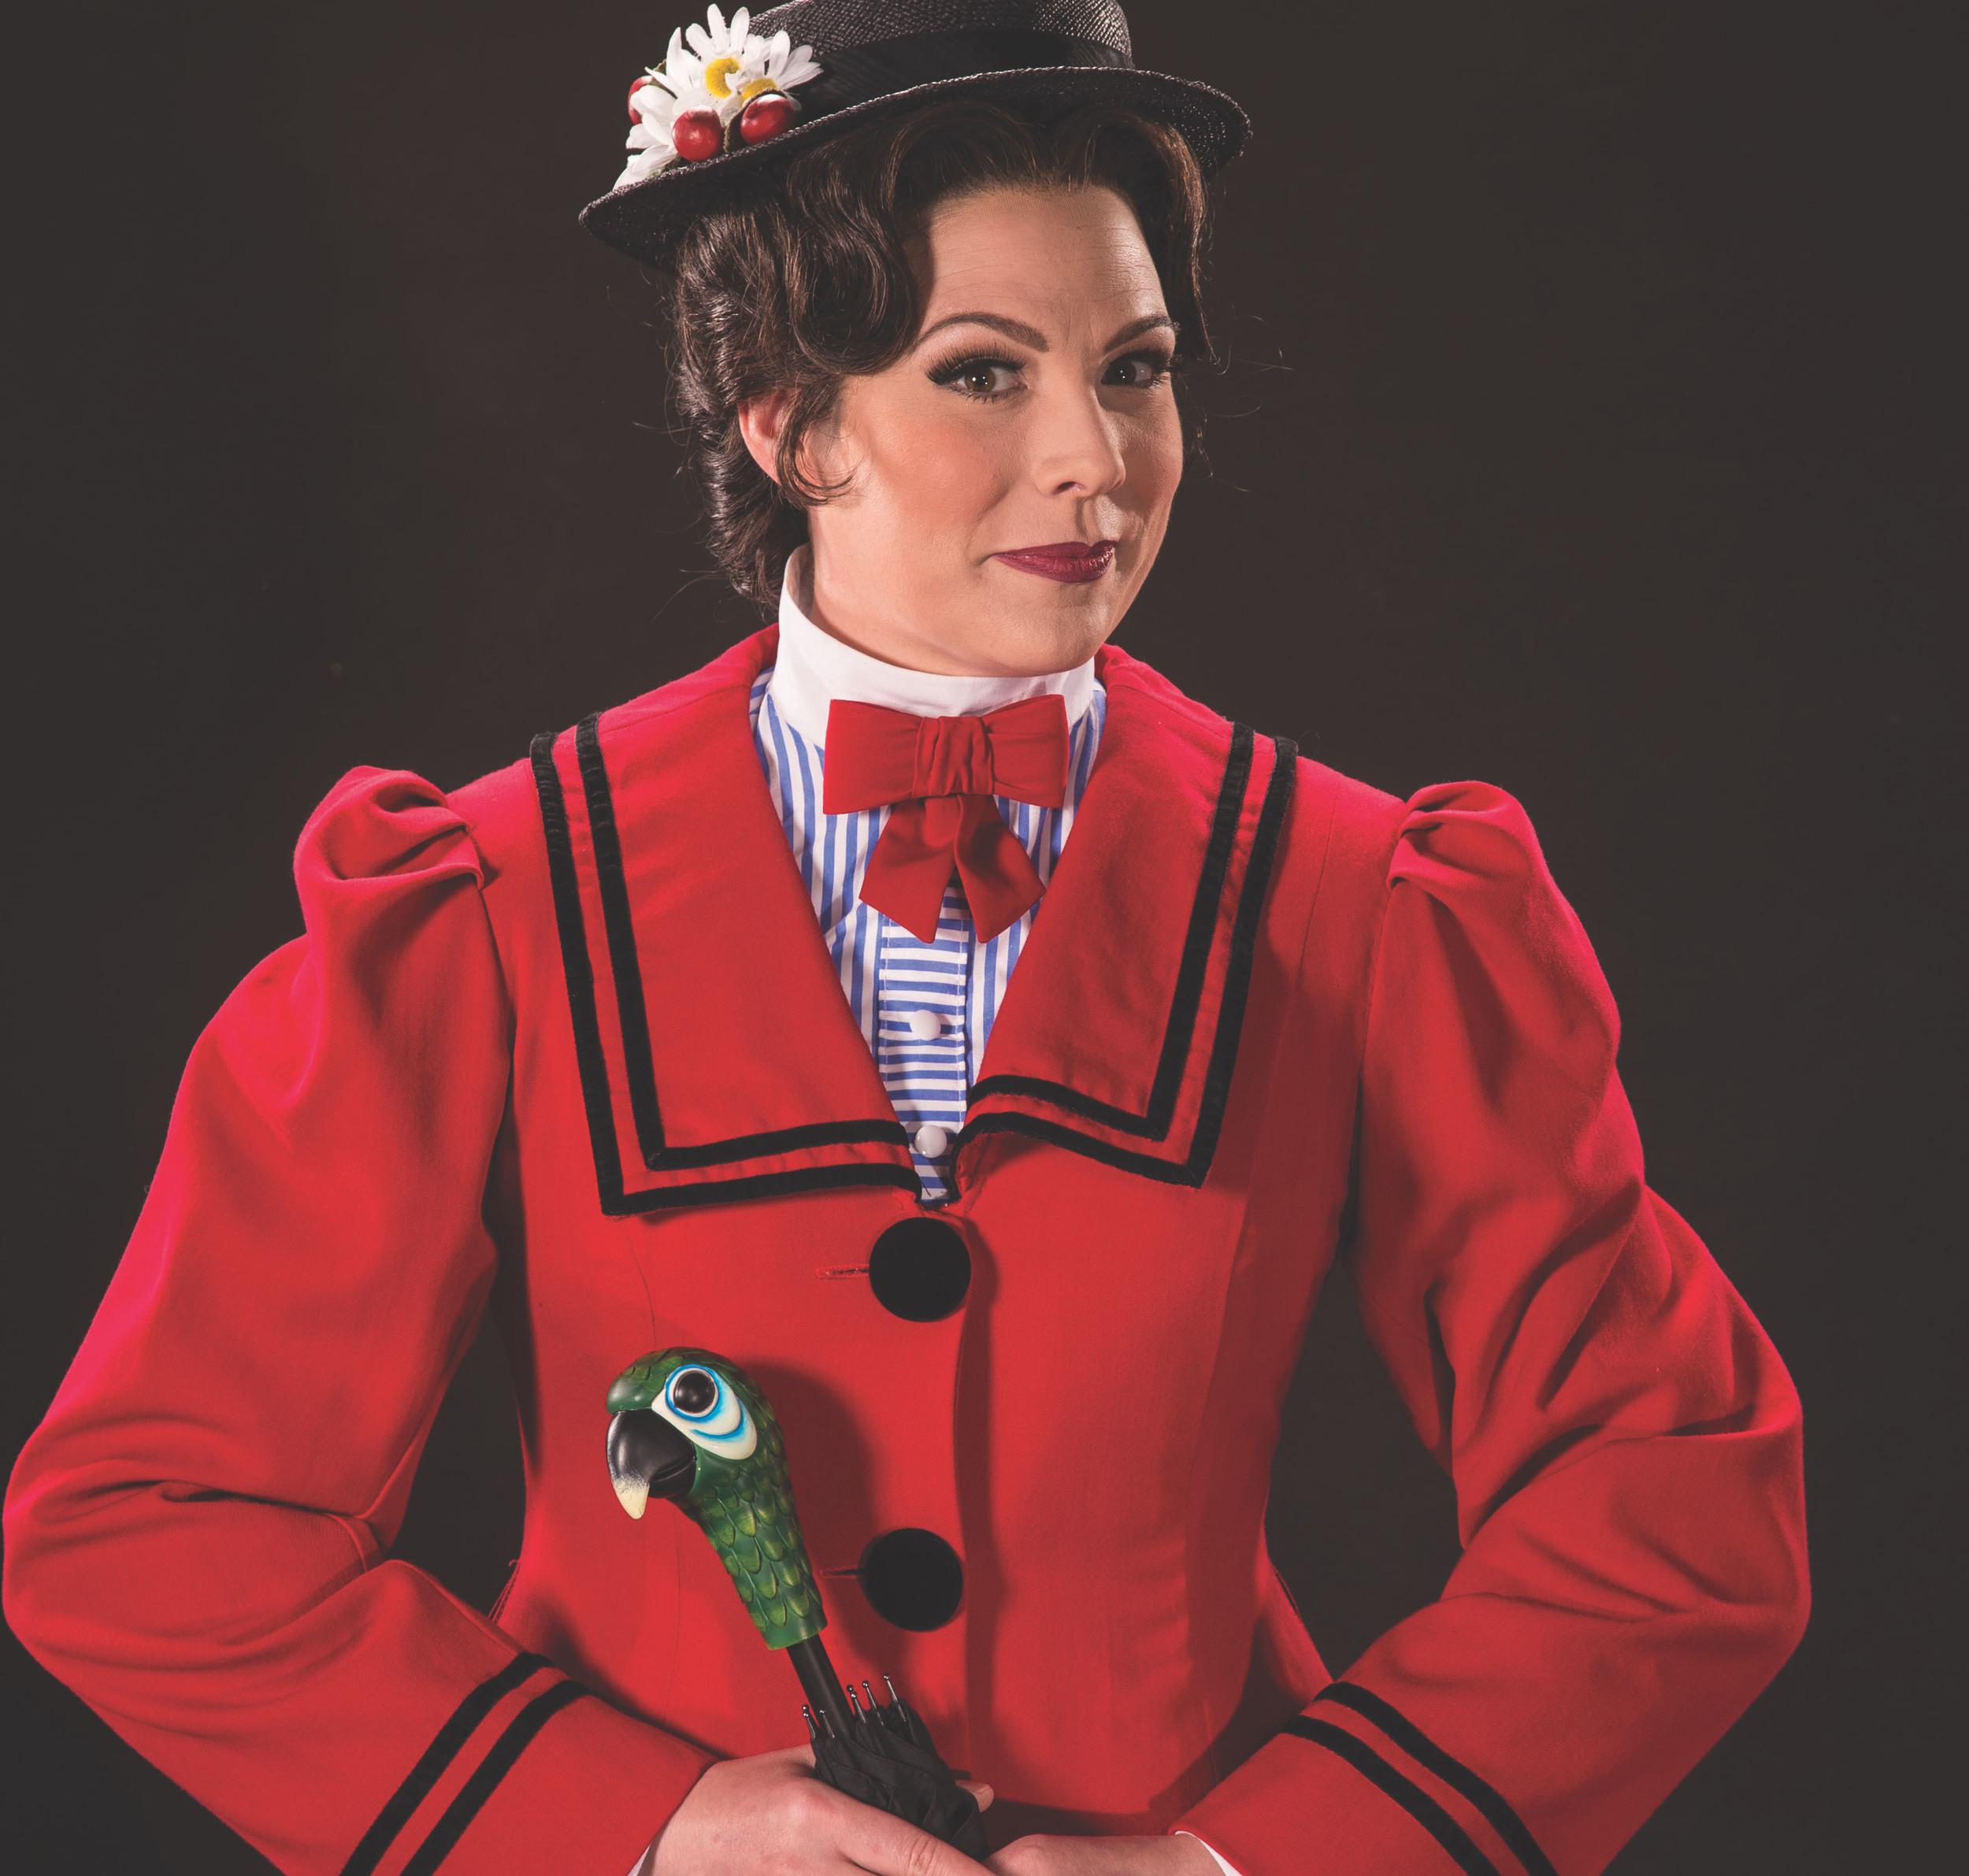 Elizabeth Broadhurst as Mary Poppins